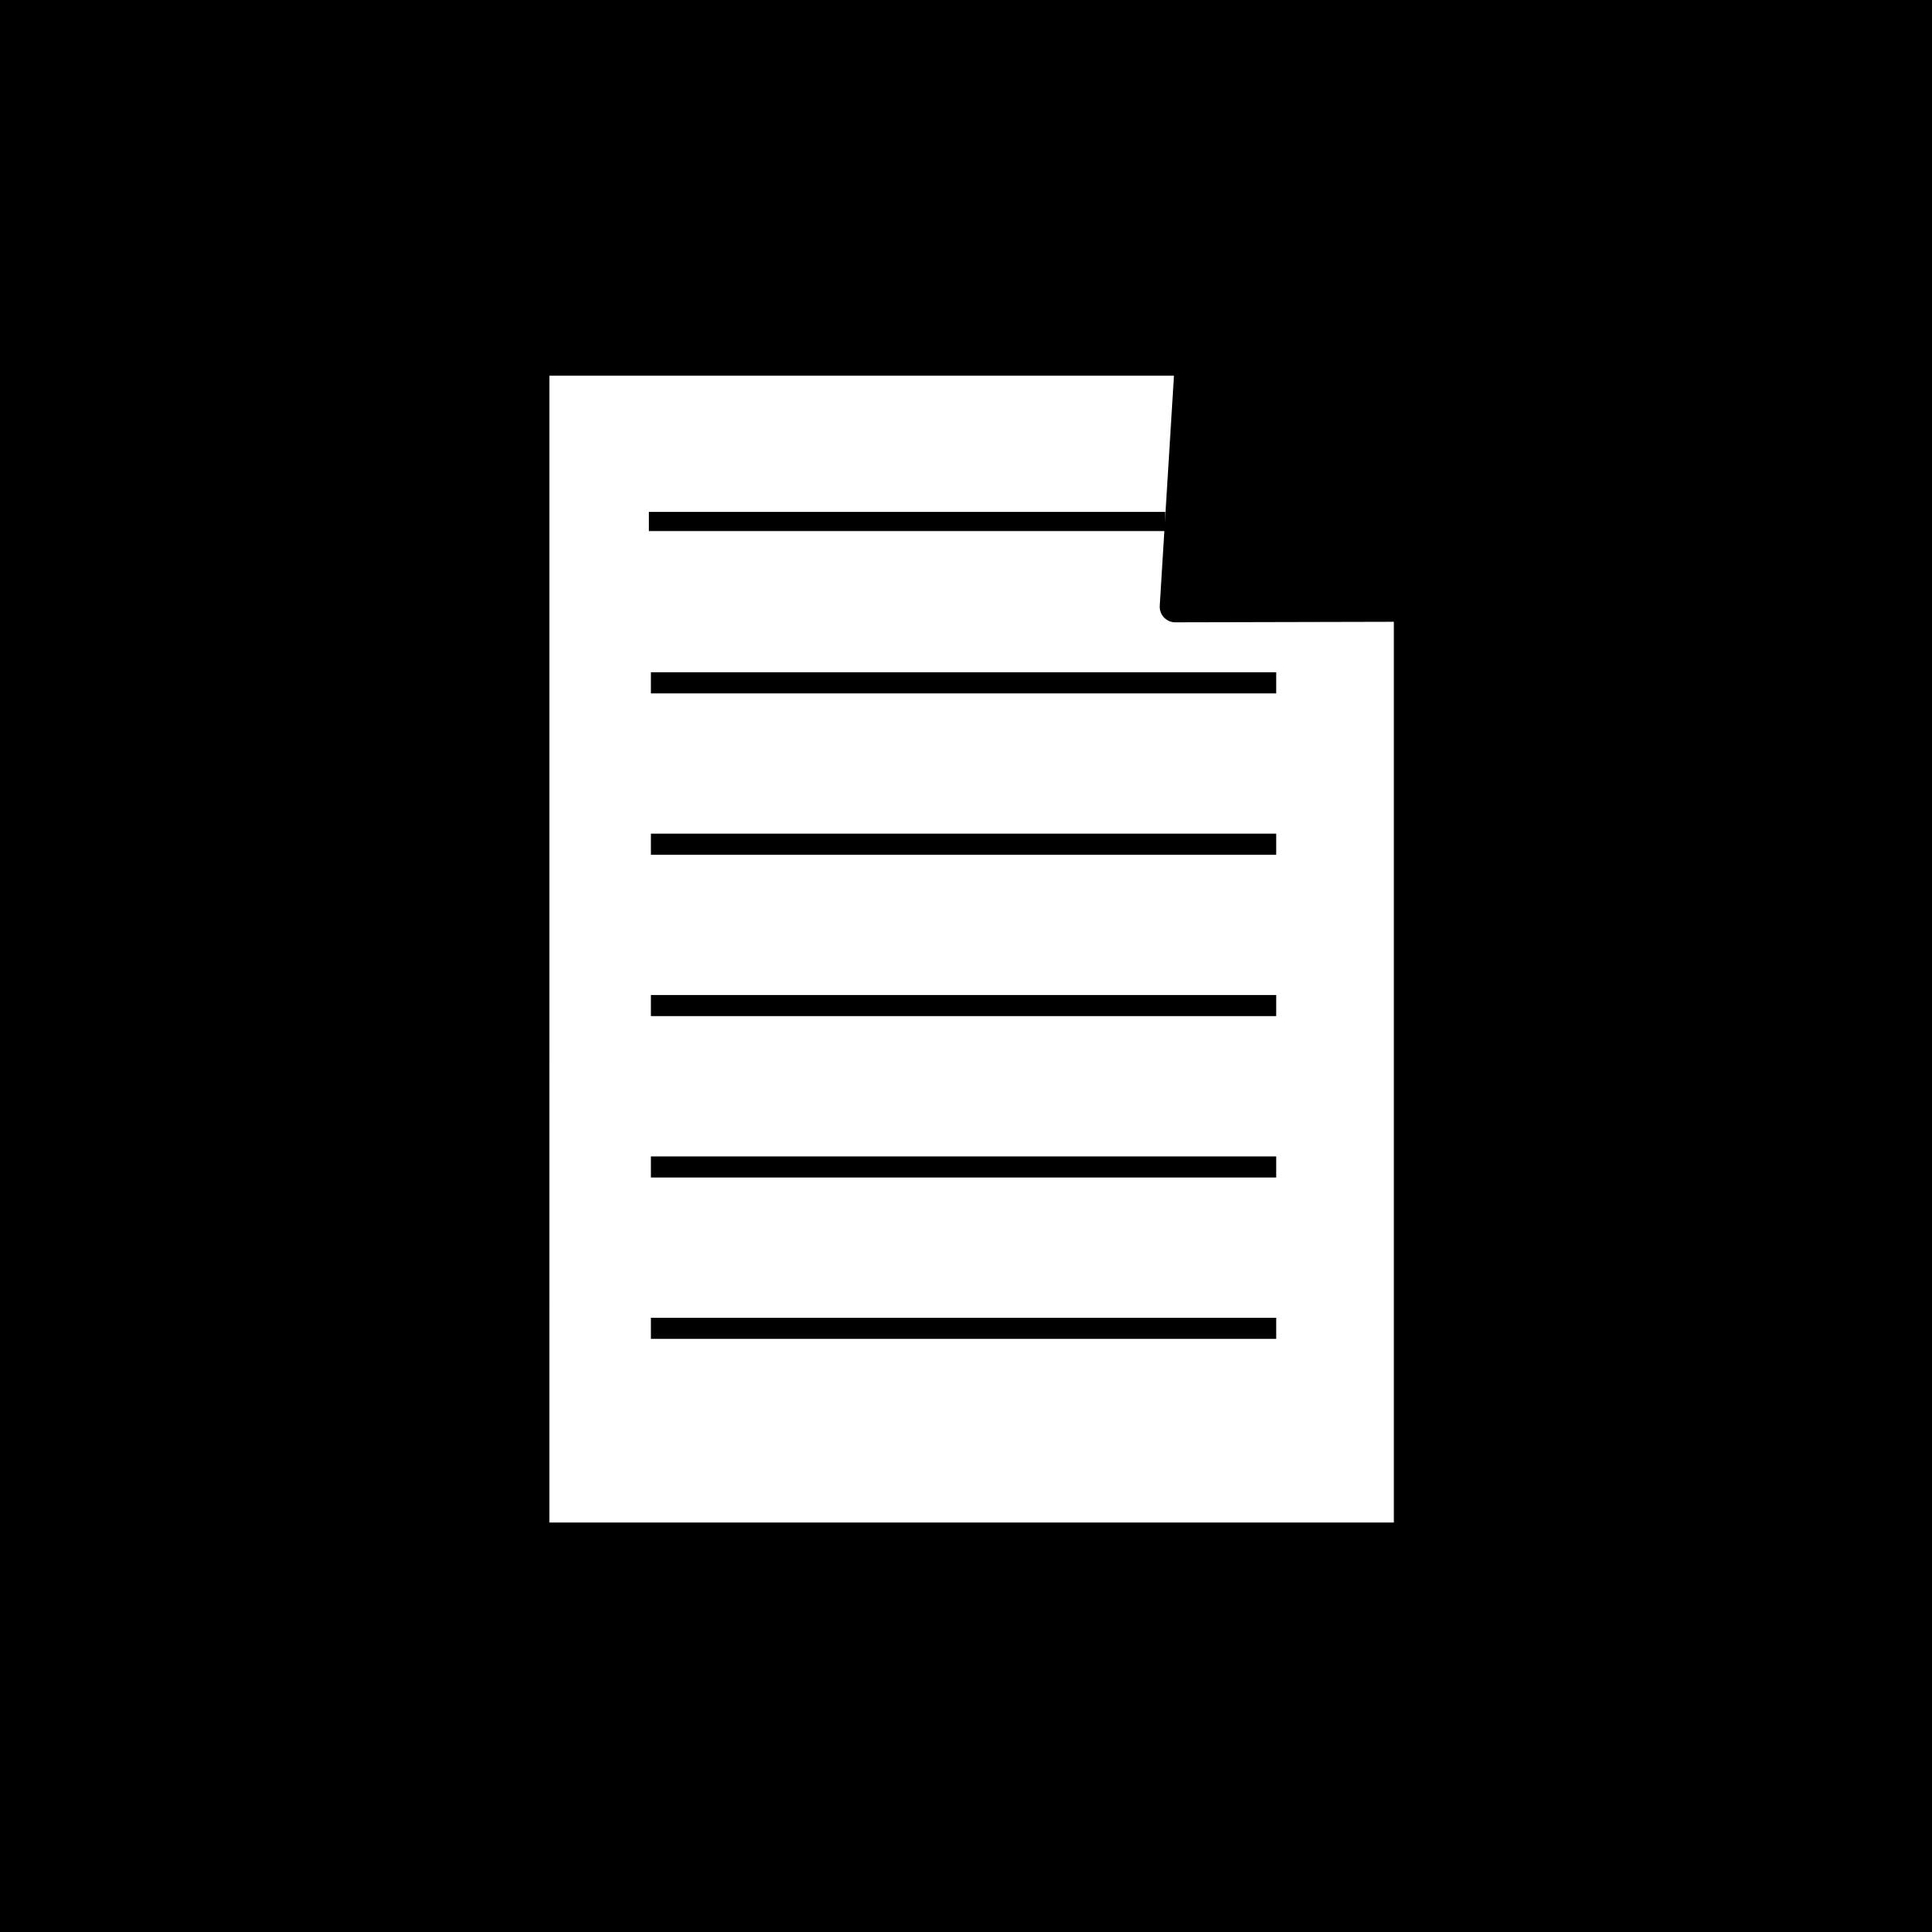 Free Paper Icon Cliparts, Download Free Clip Art, Free Clip.